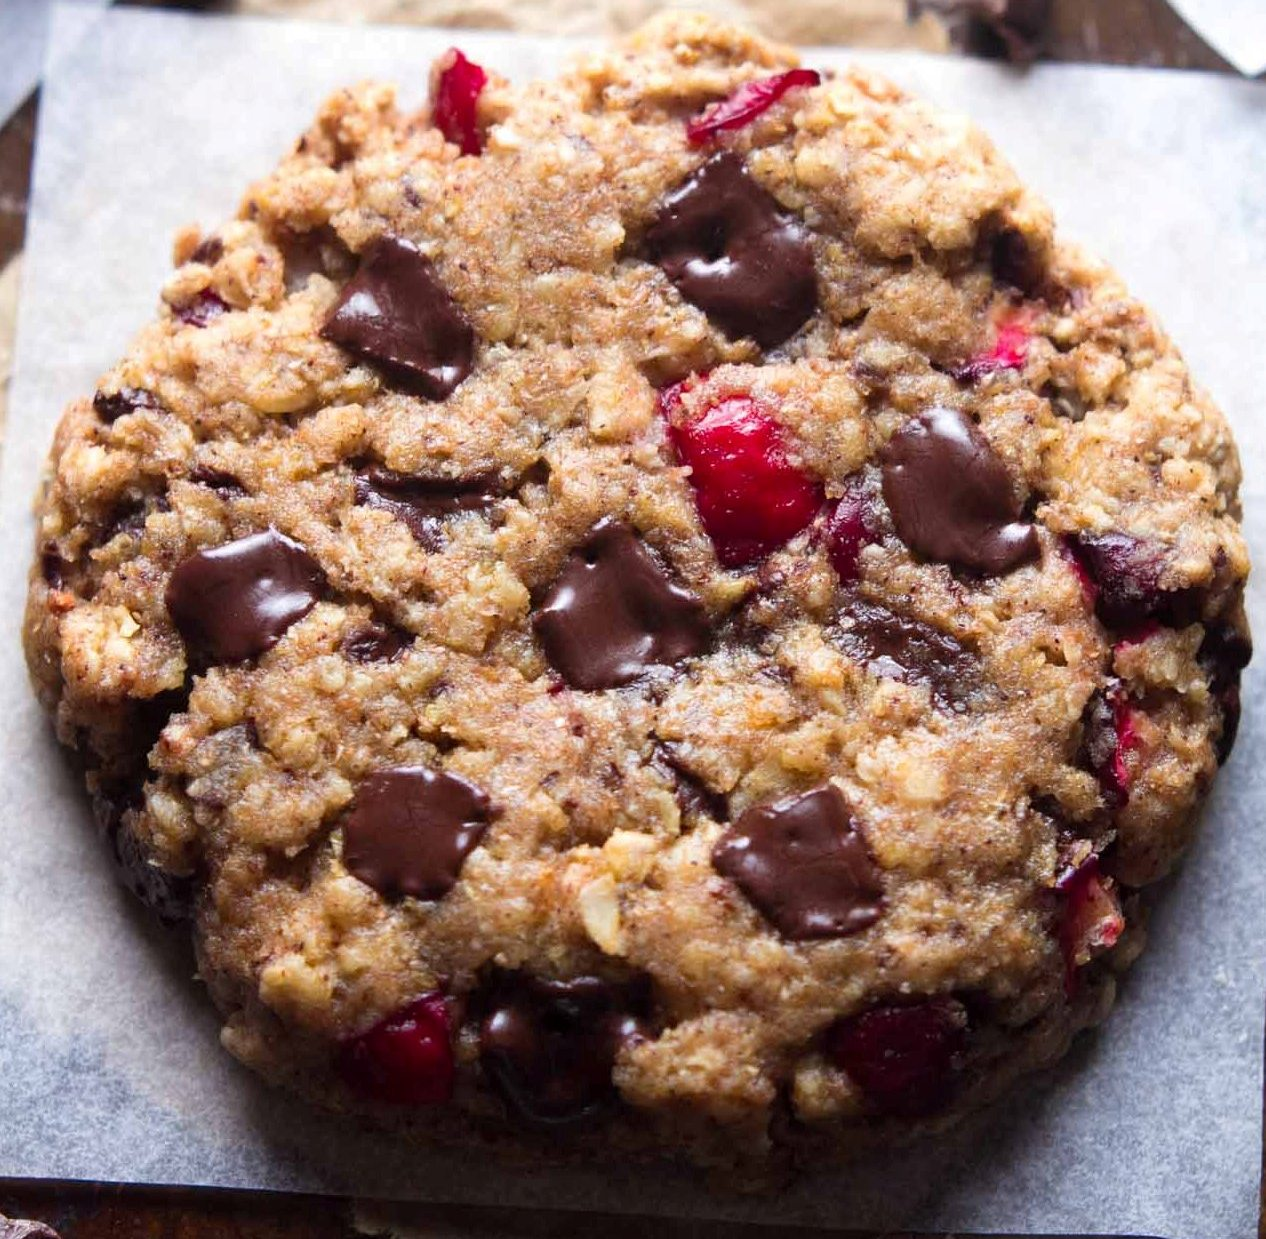 dark-chocolate-cranberry-oatmeal-cookies-7185